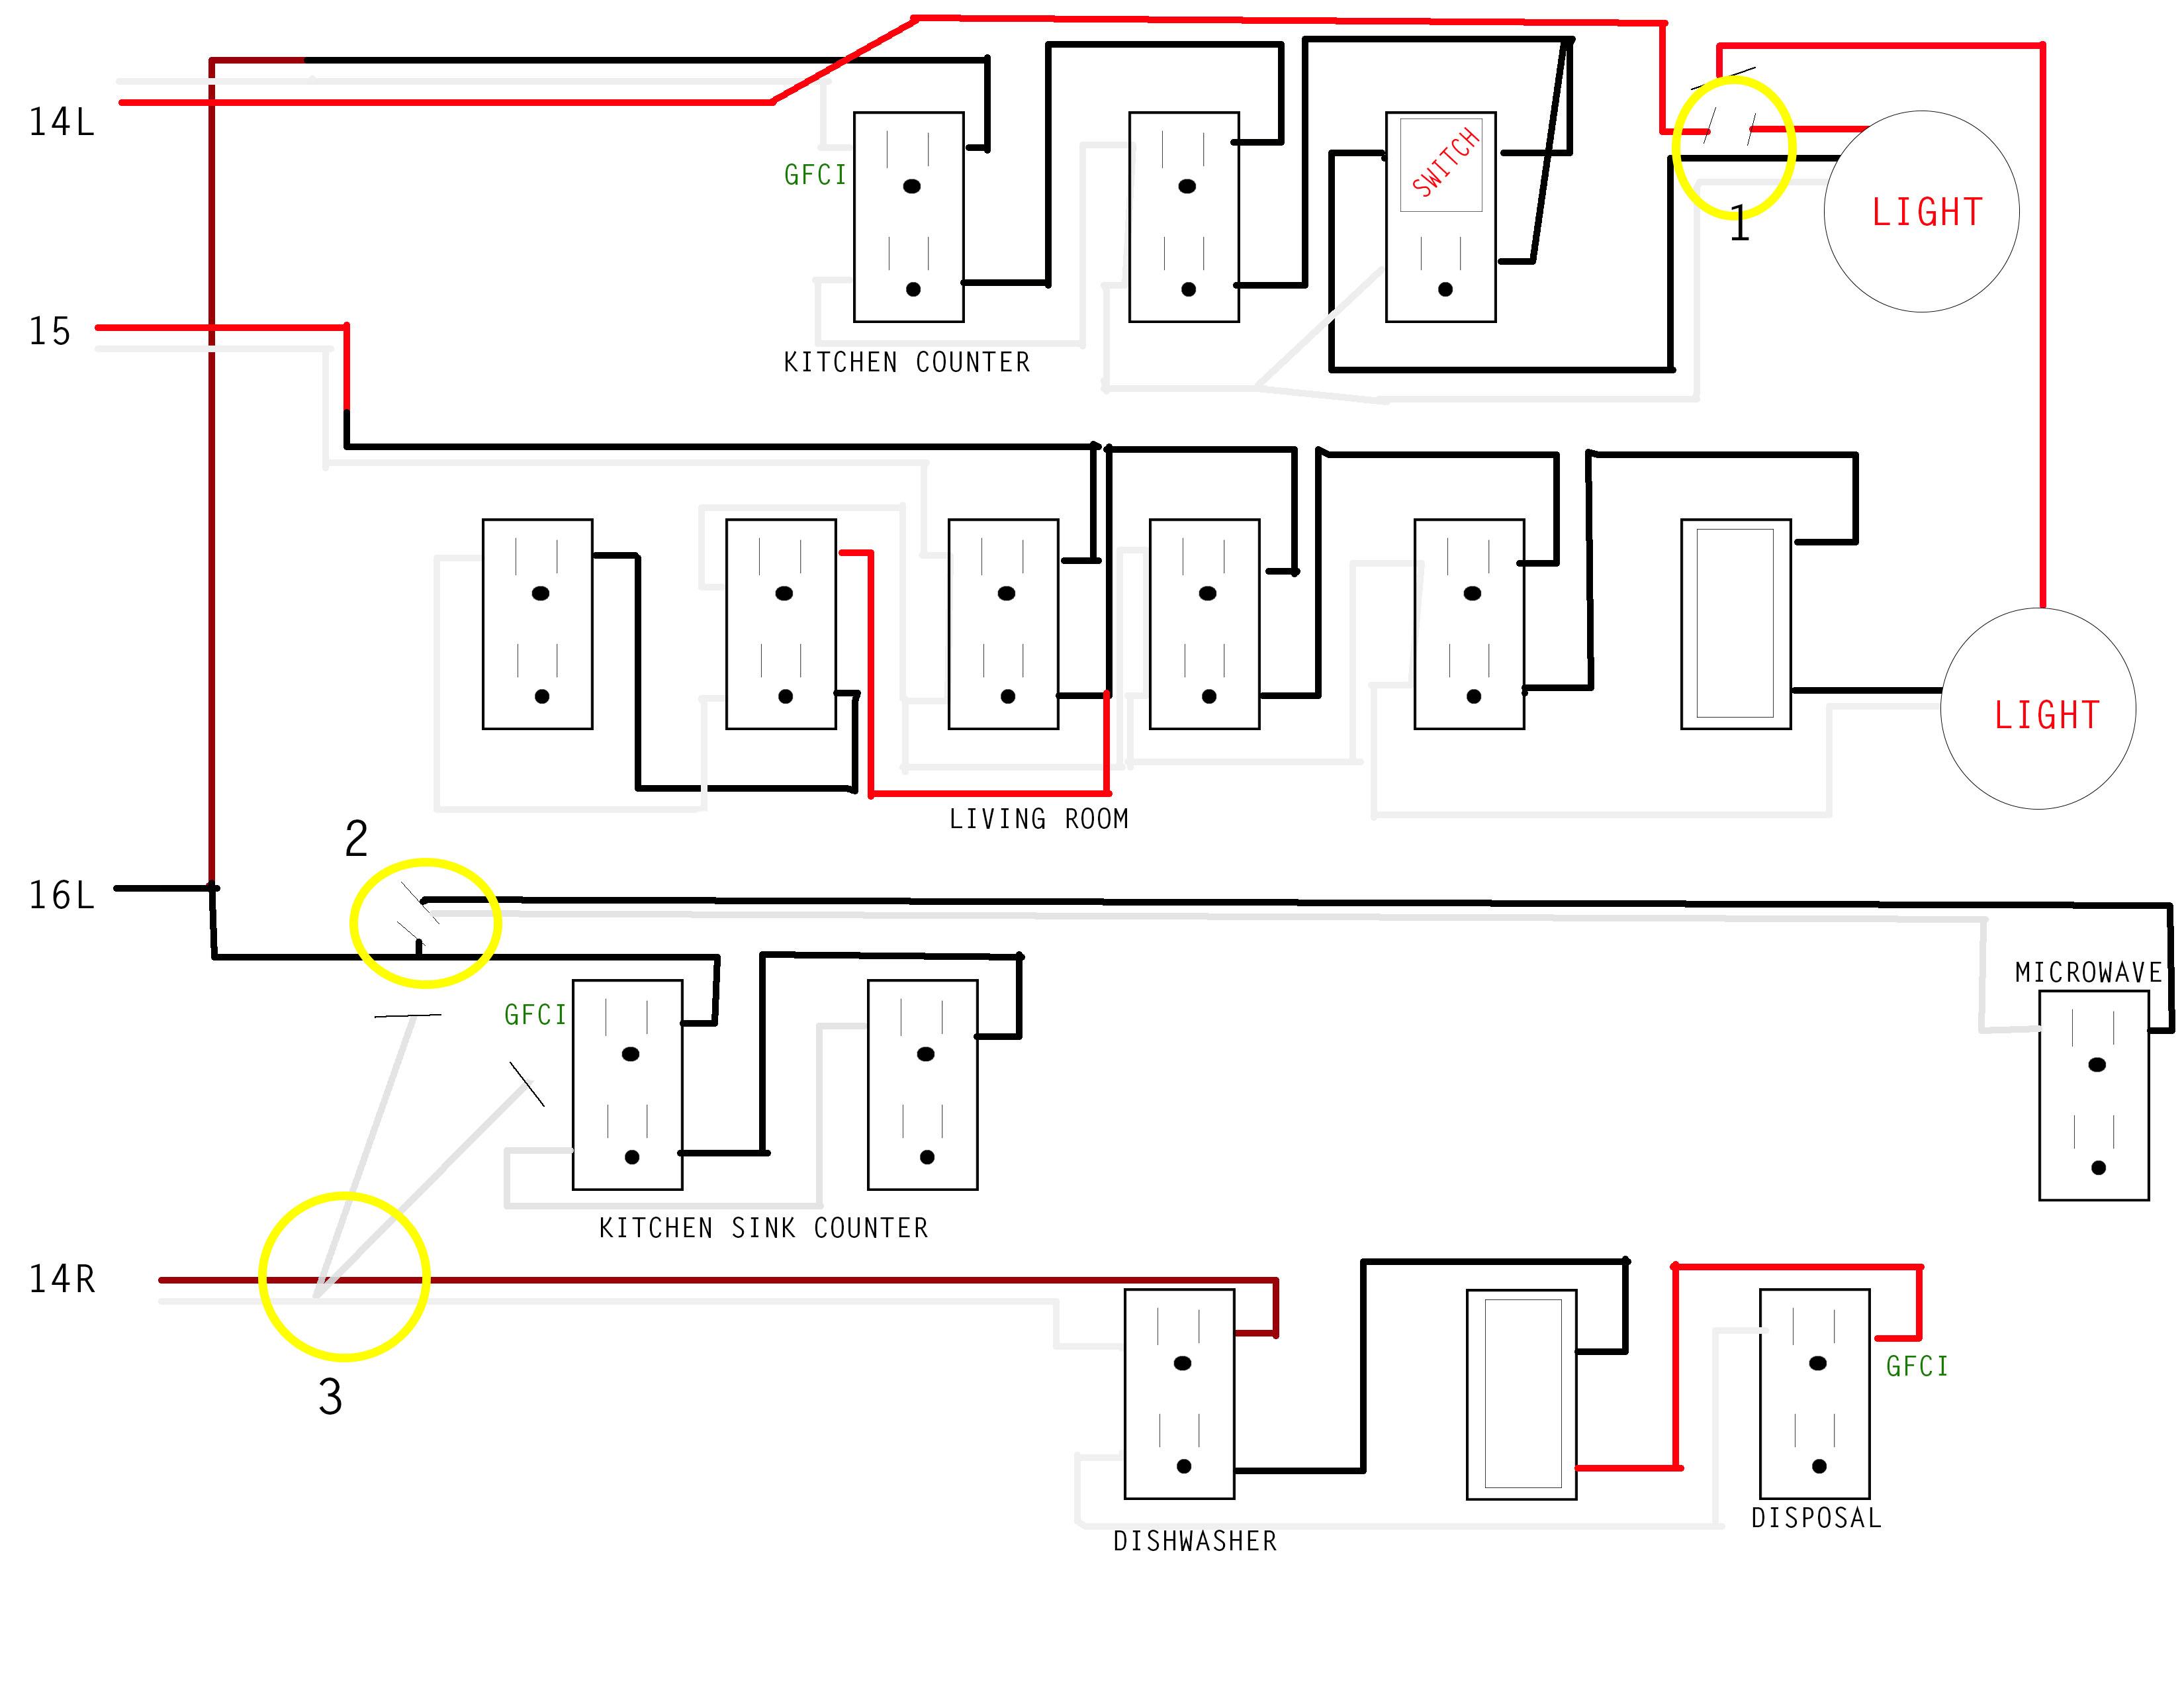 diagram receptacle split circuit cat 5 wiring kitchen issue home improvement stack exchange